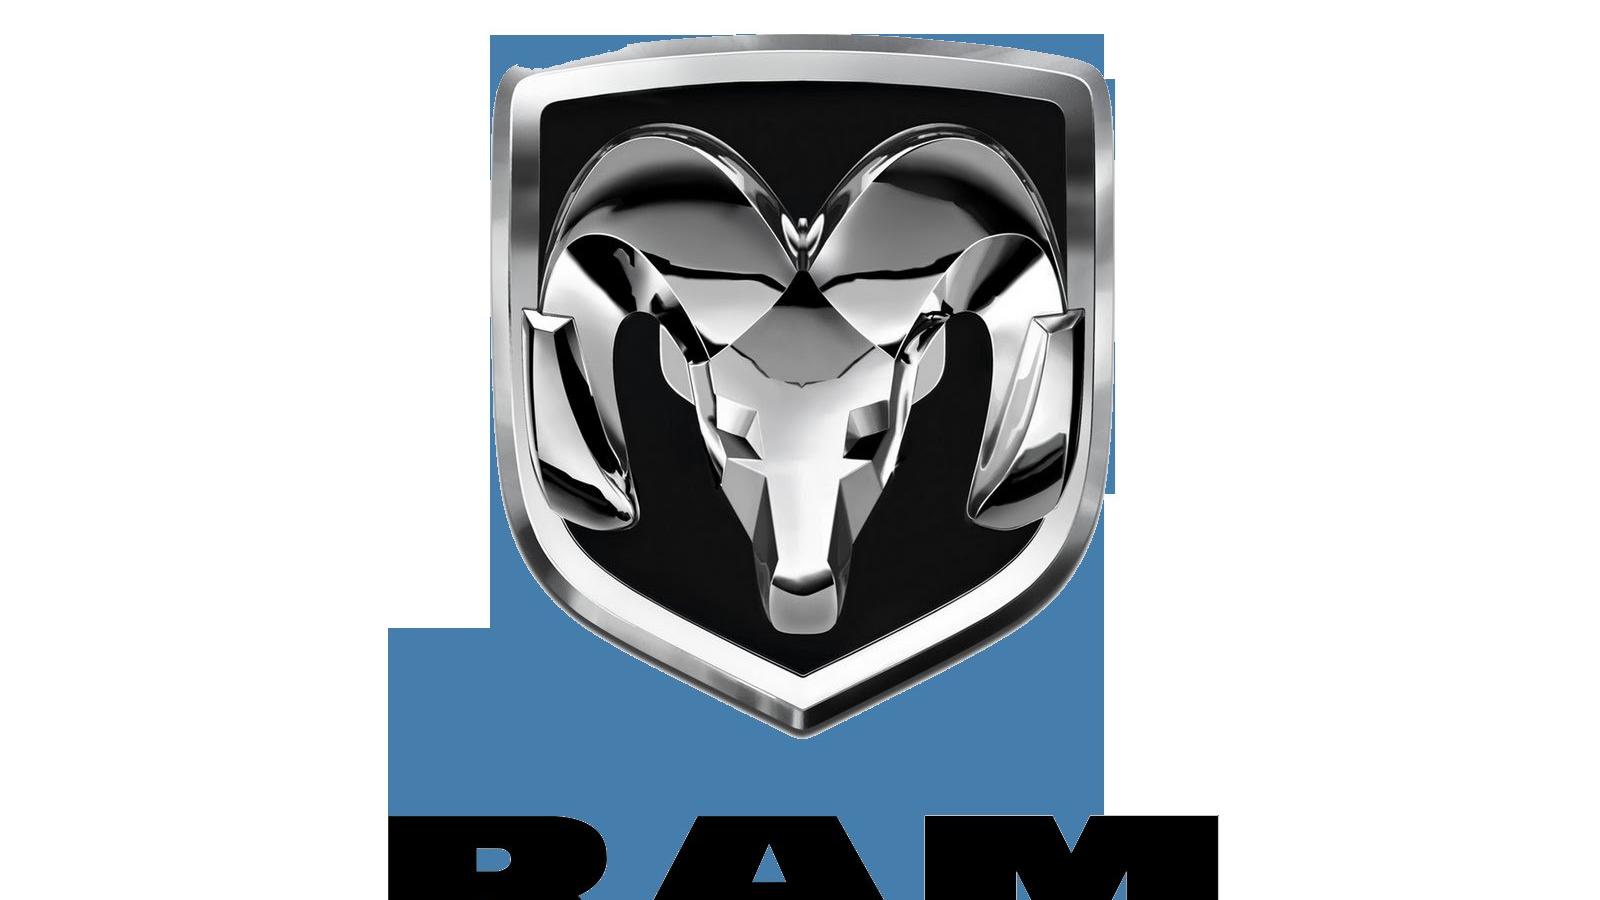 Dodge Ram Logo Wallpapers Image Desktop Background